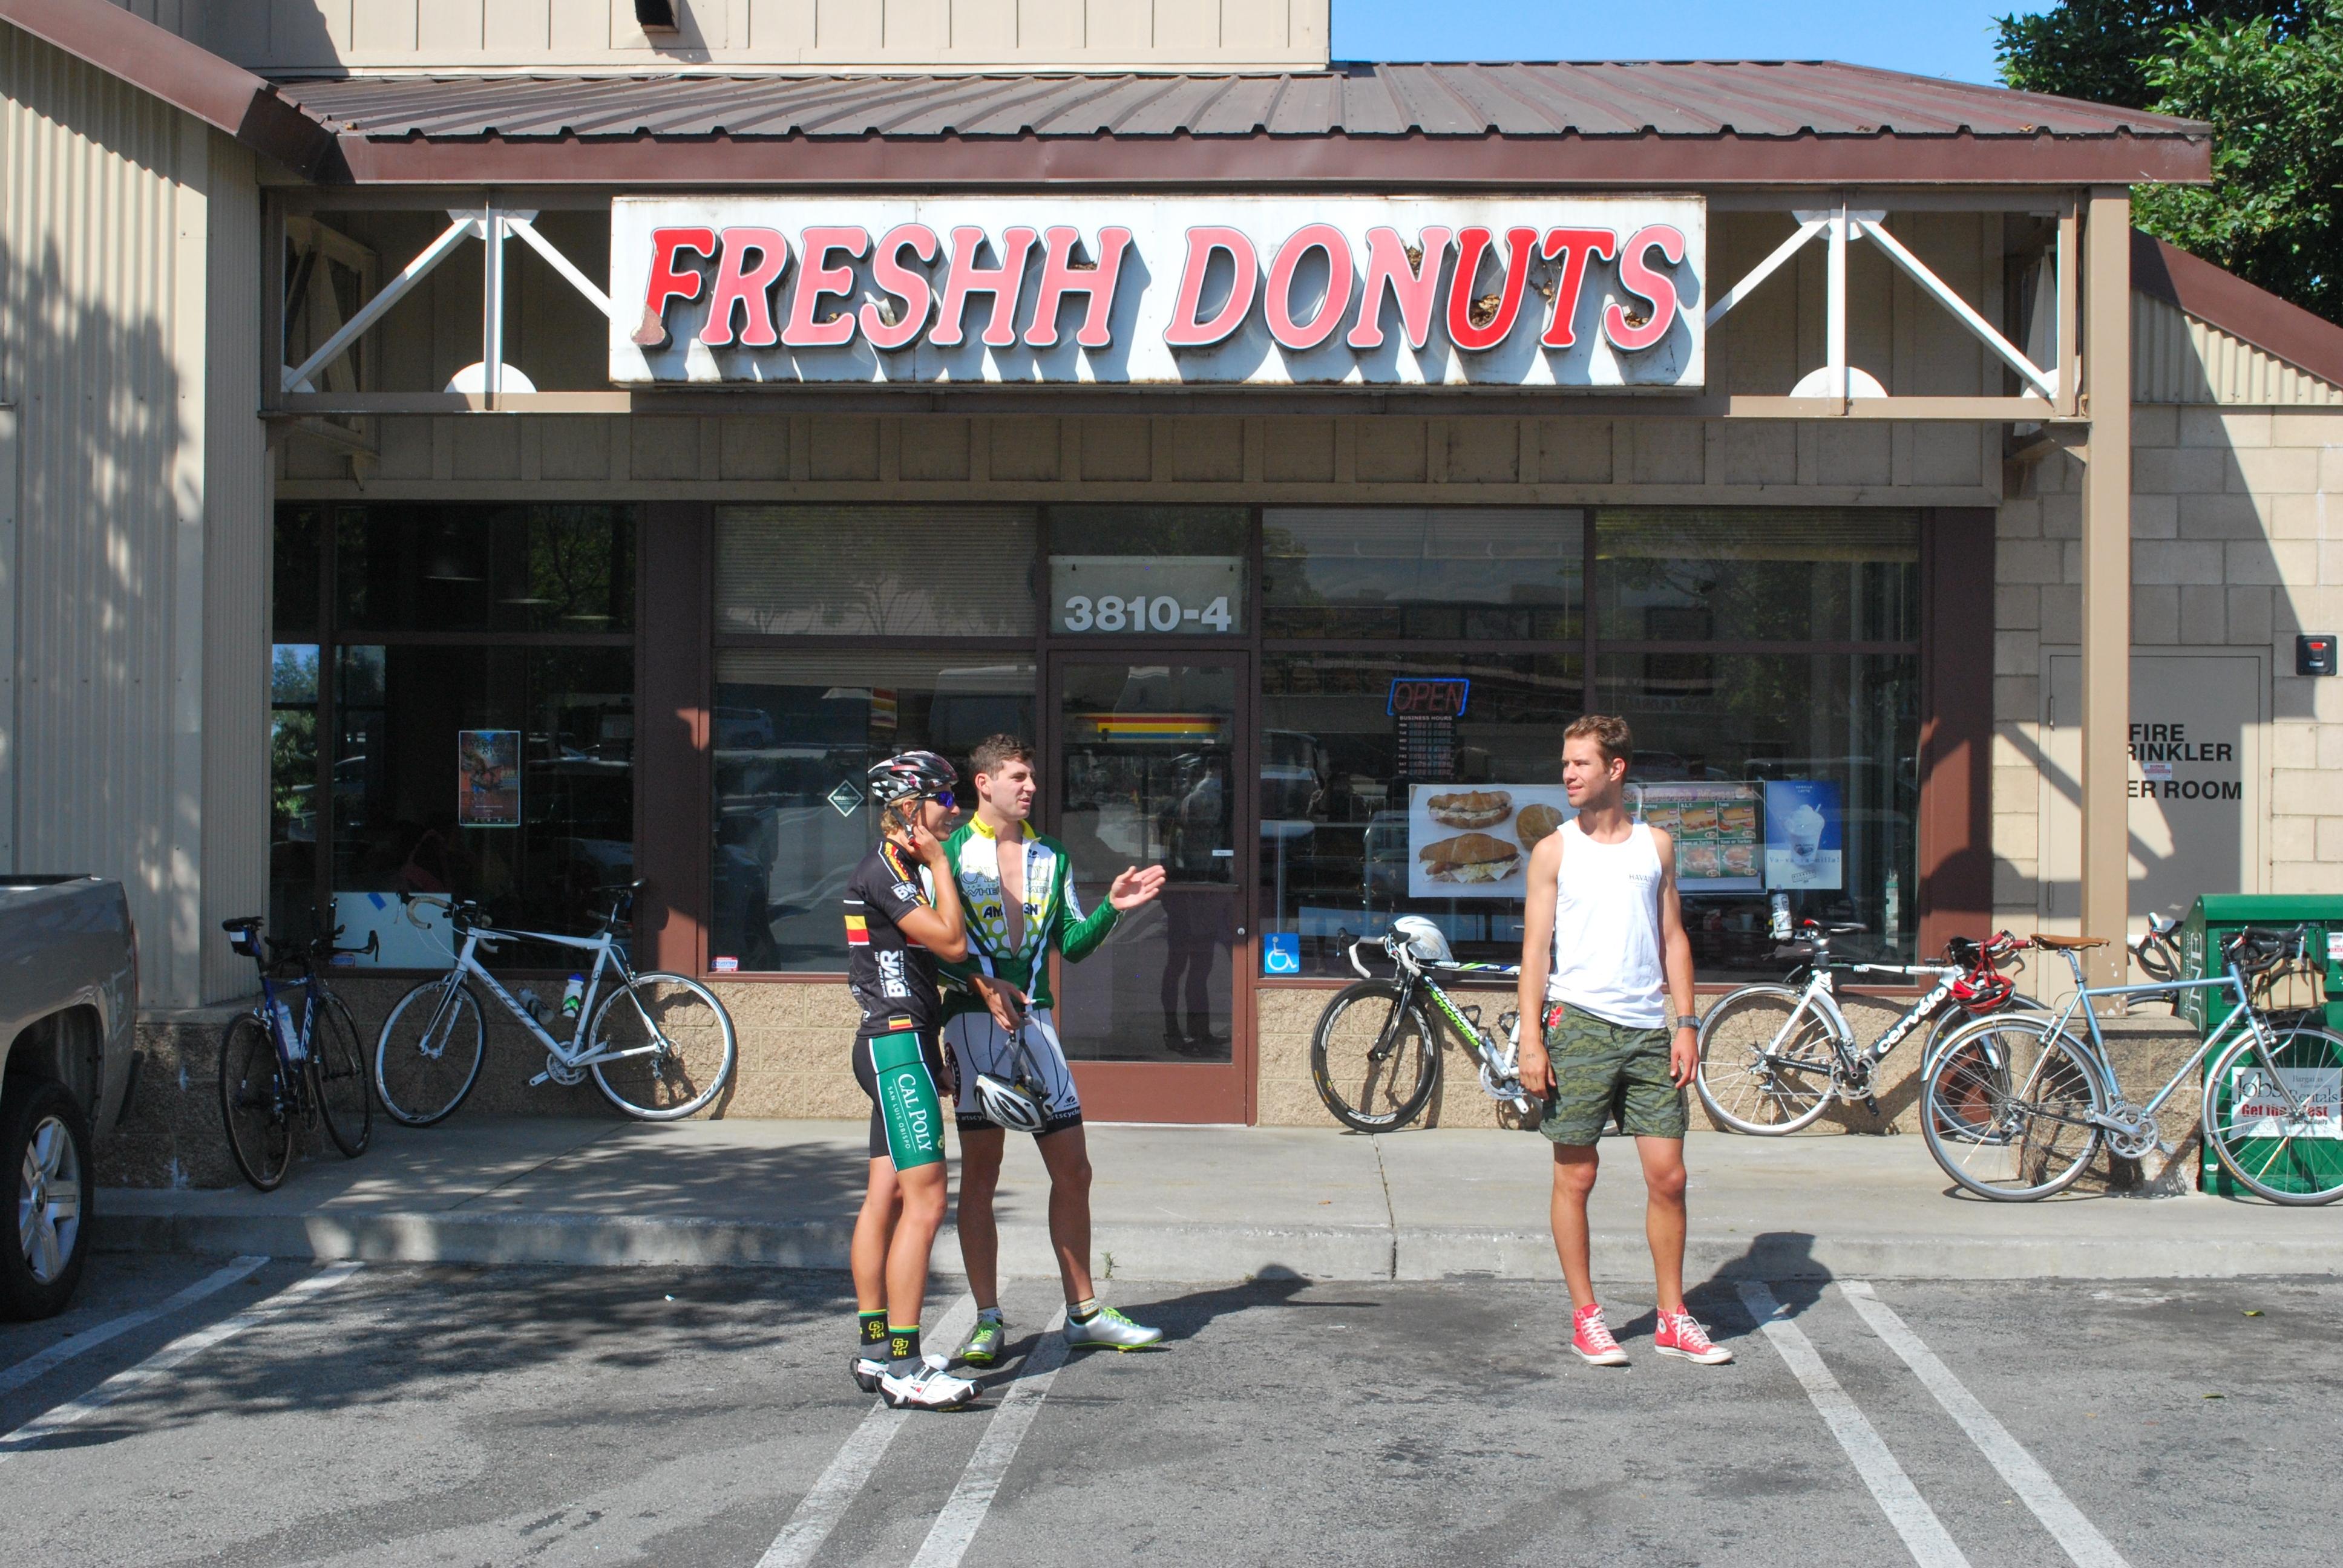 Freshdonuts